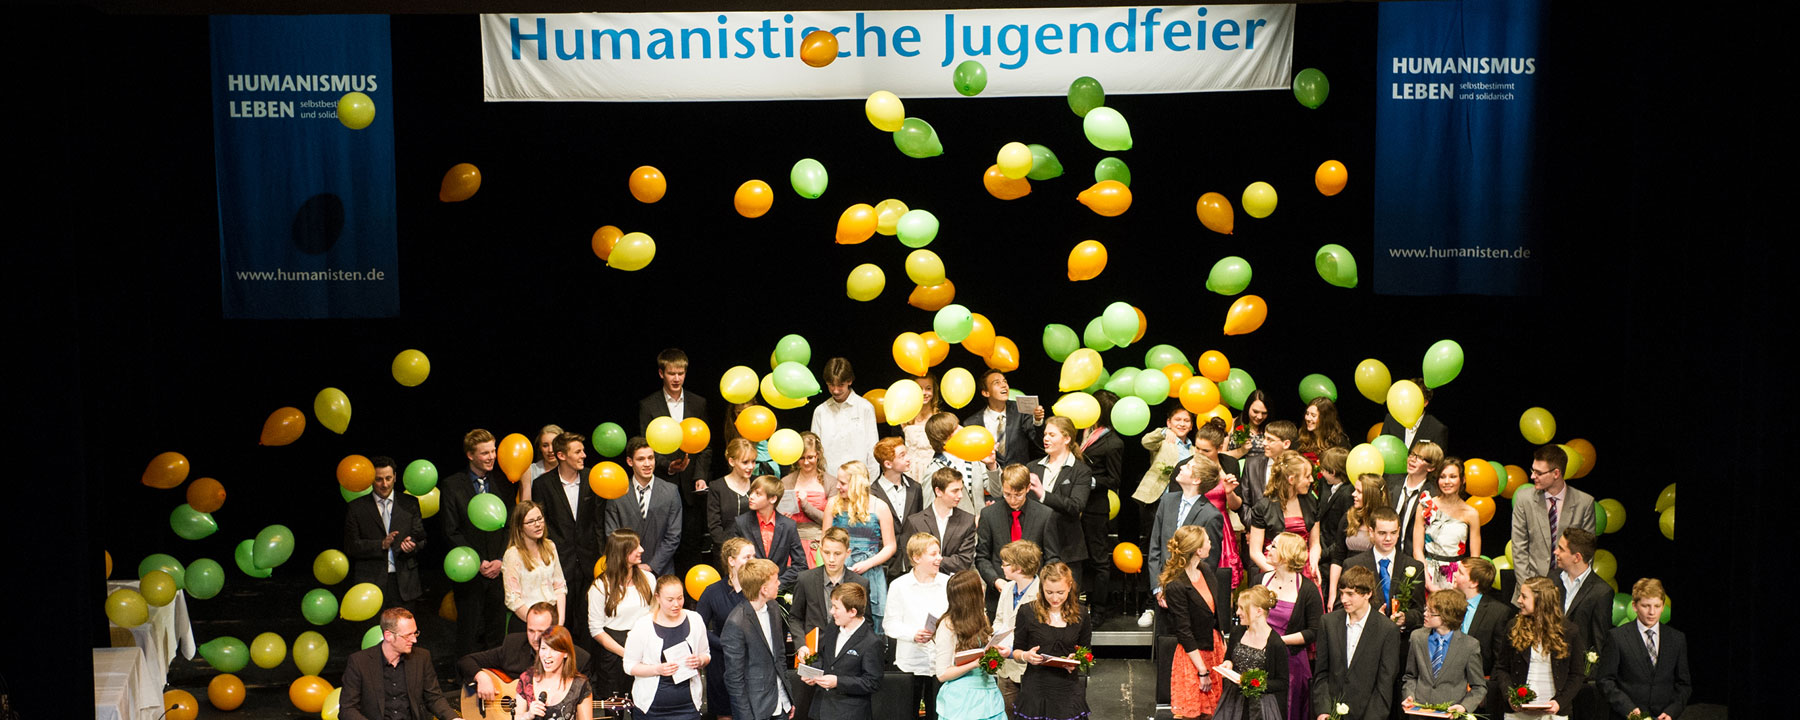 Jugendfeier in Hannover